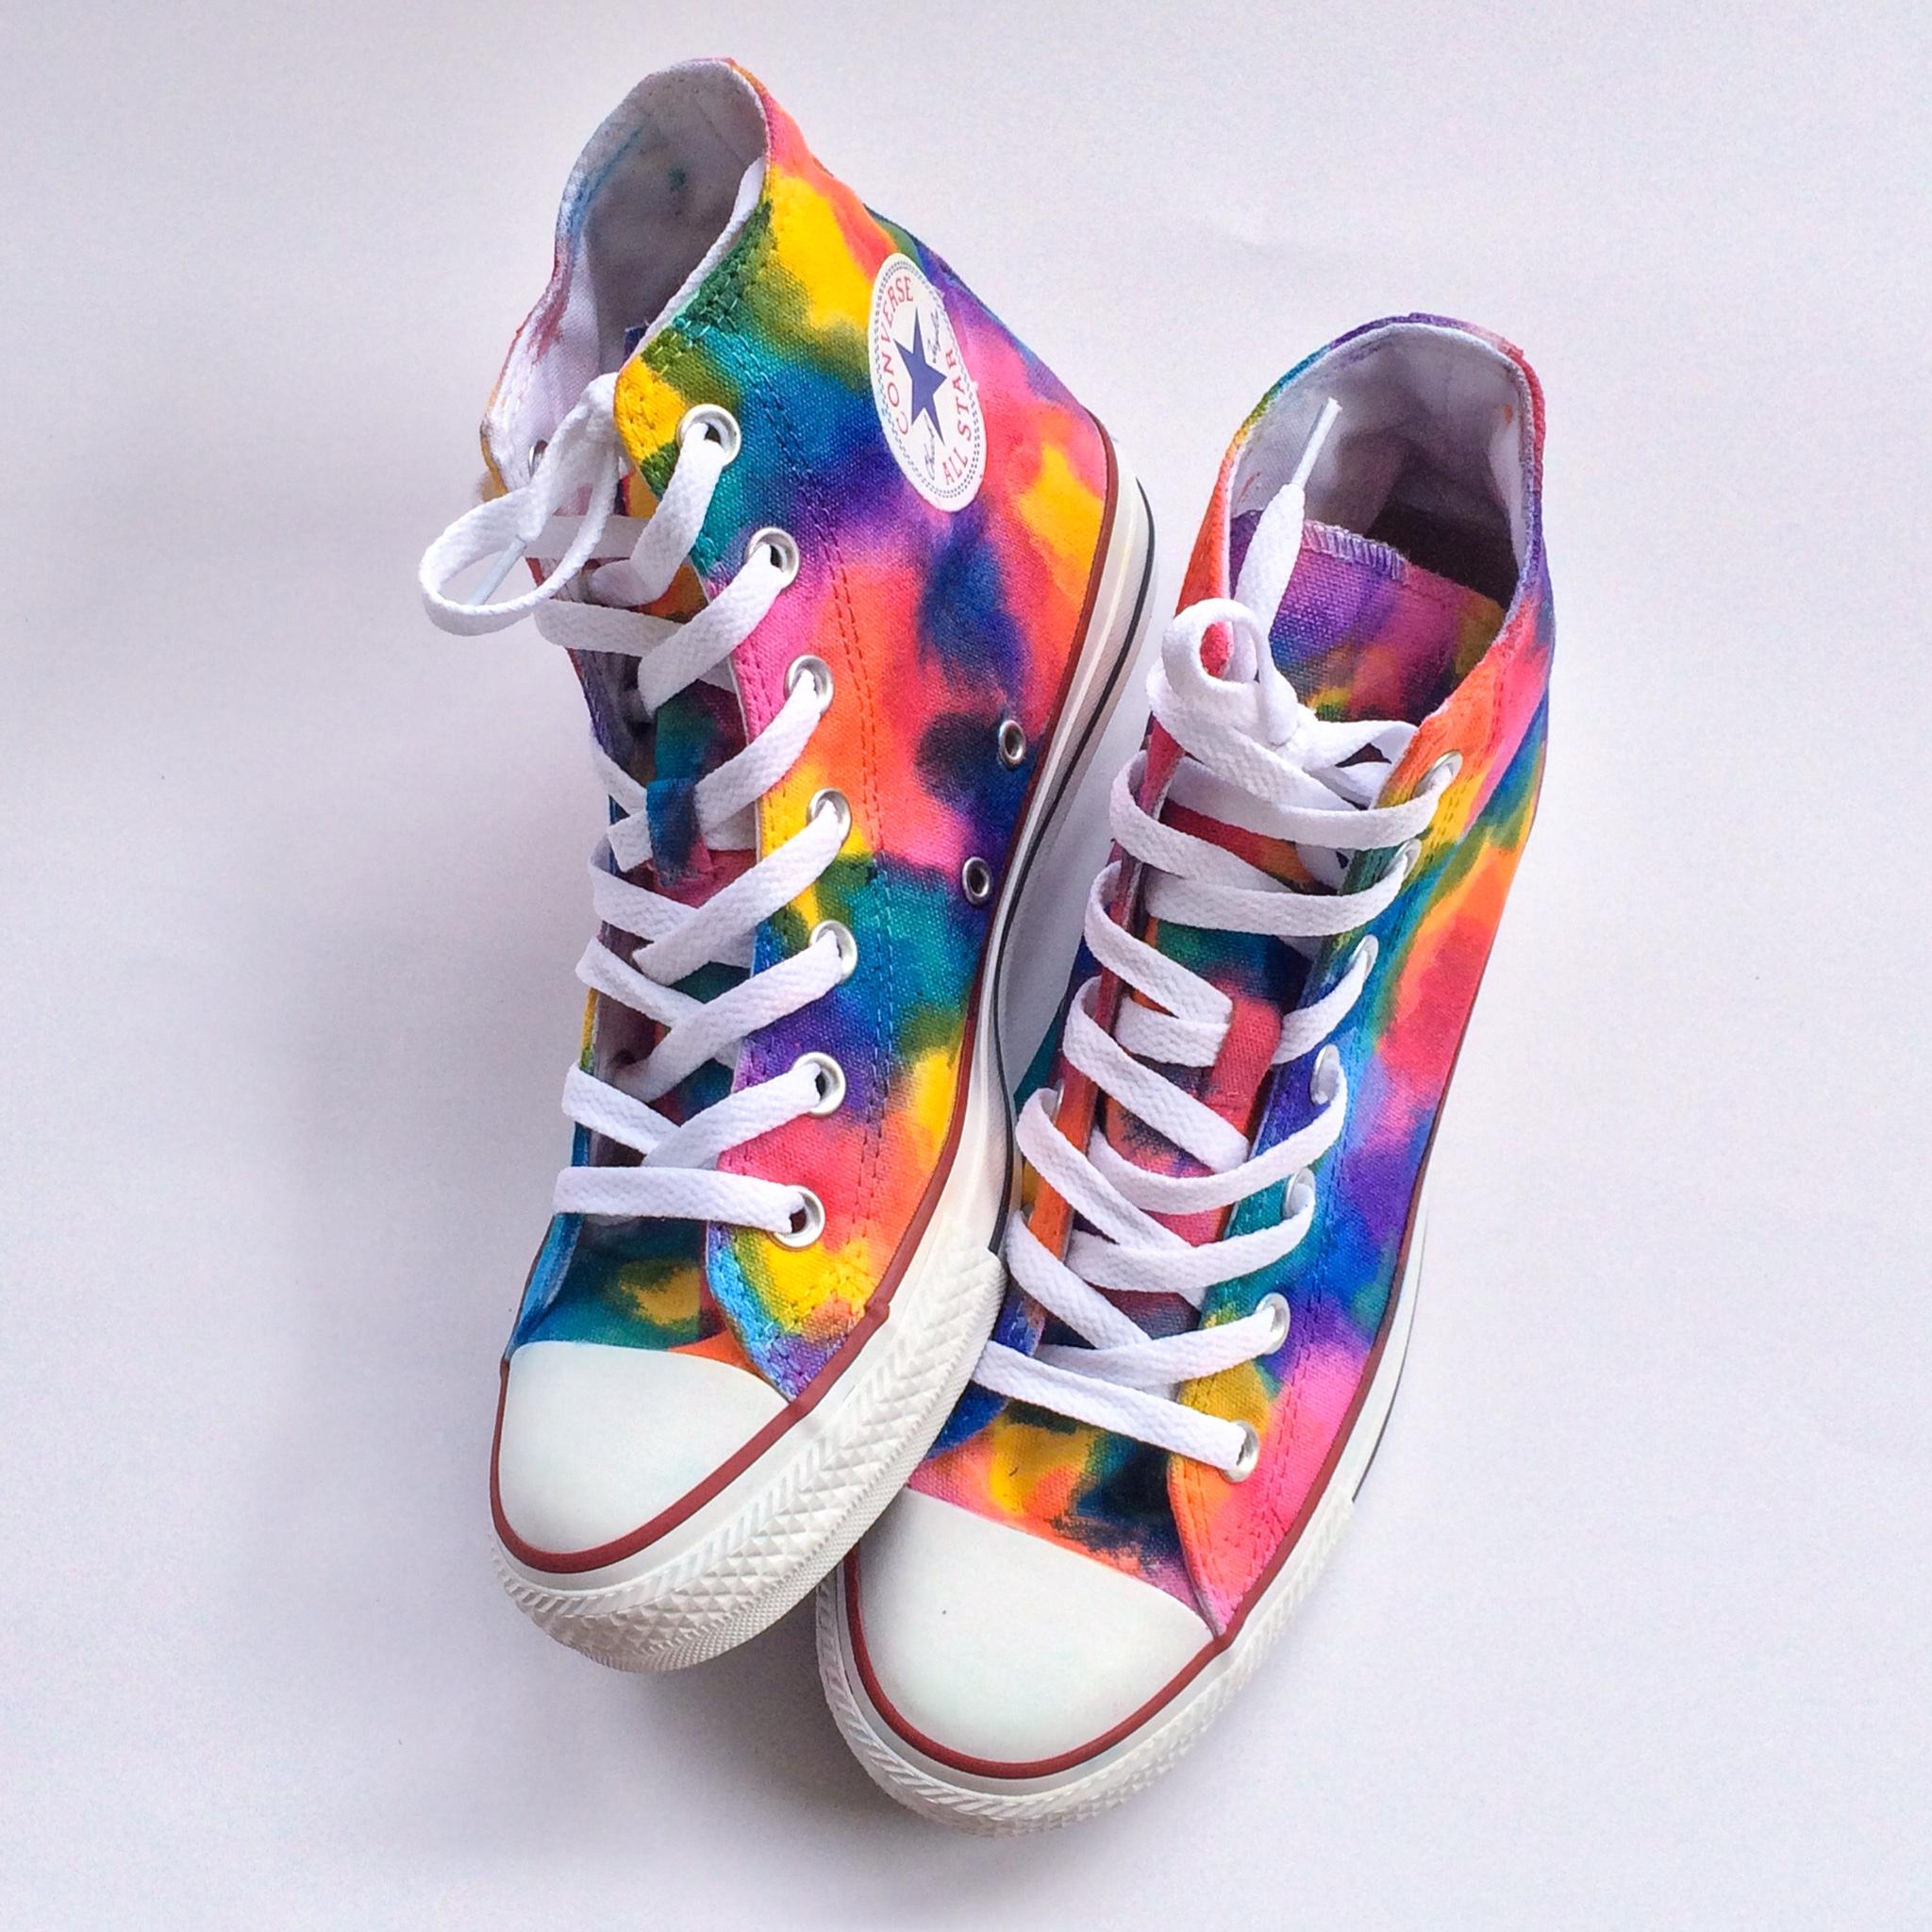 Rainbow Tie Dye Converse Shoes